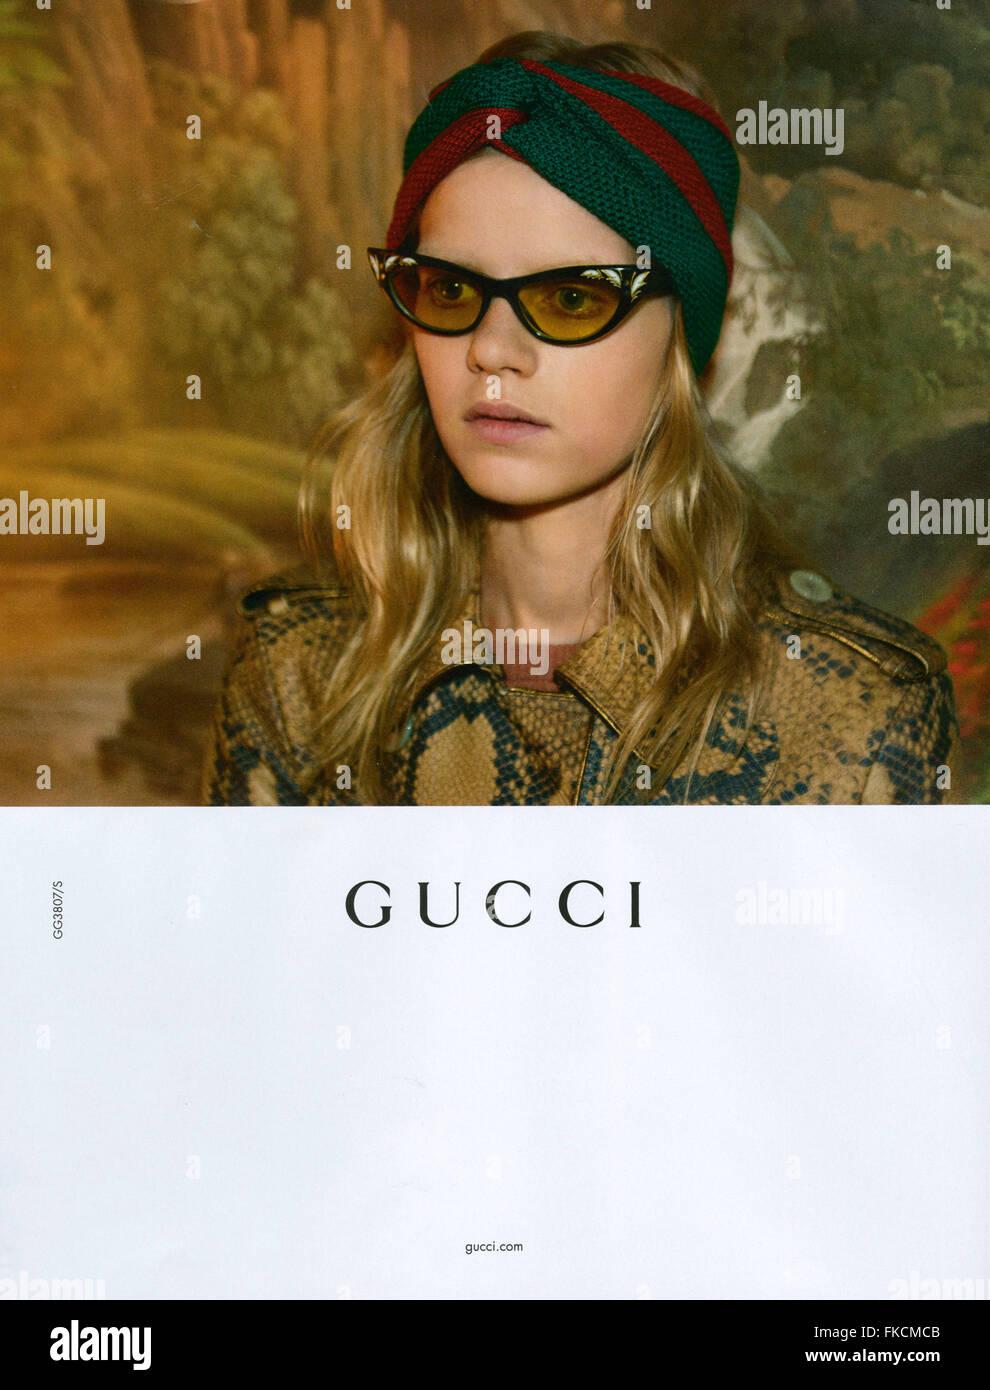 cf9a61c8c4cb 2010er Jahre UK Gucci Magazin Anzeige Stockfoto, Bild  98009755 - Alamy